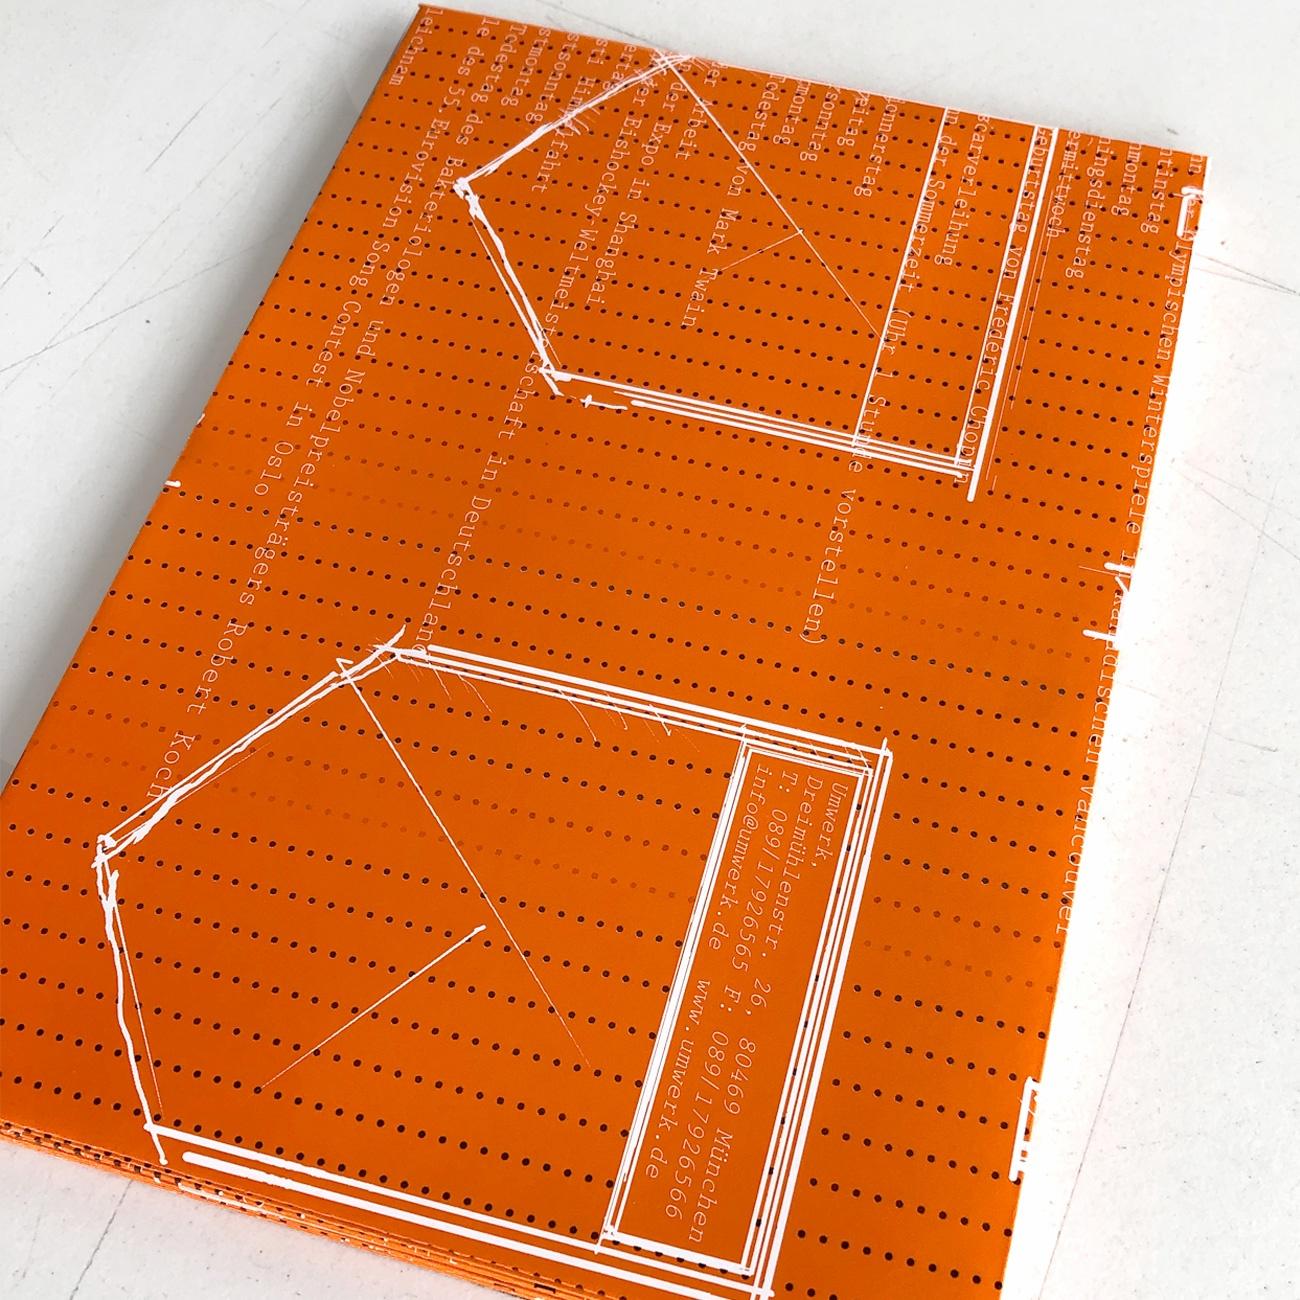 Umwerk Upcycling Kuverts, aus alten Kalenderblättern,